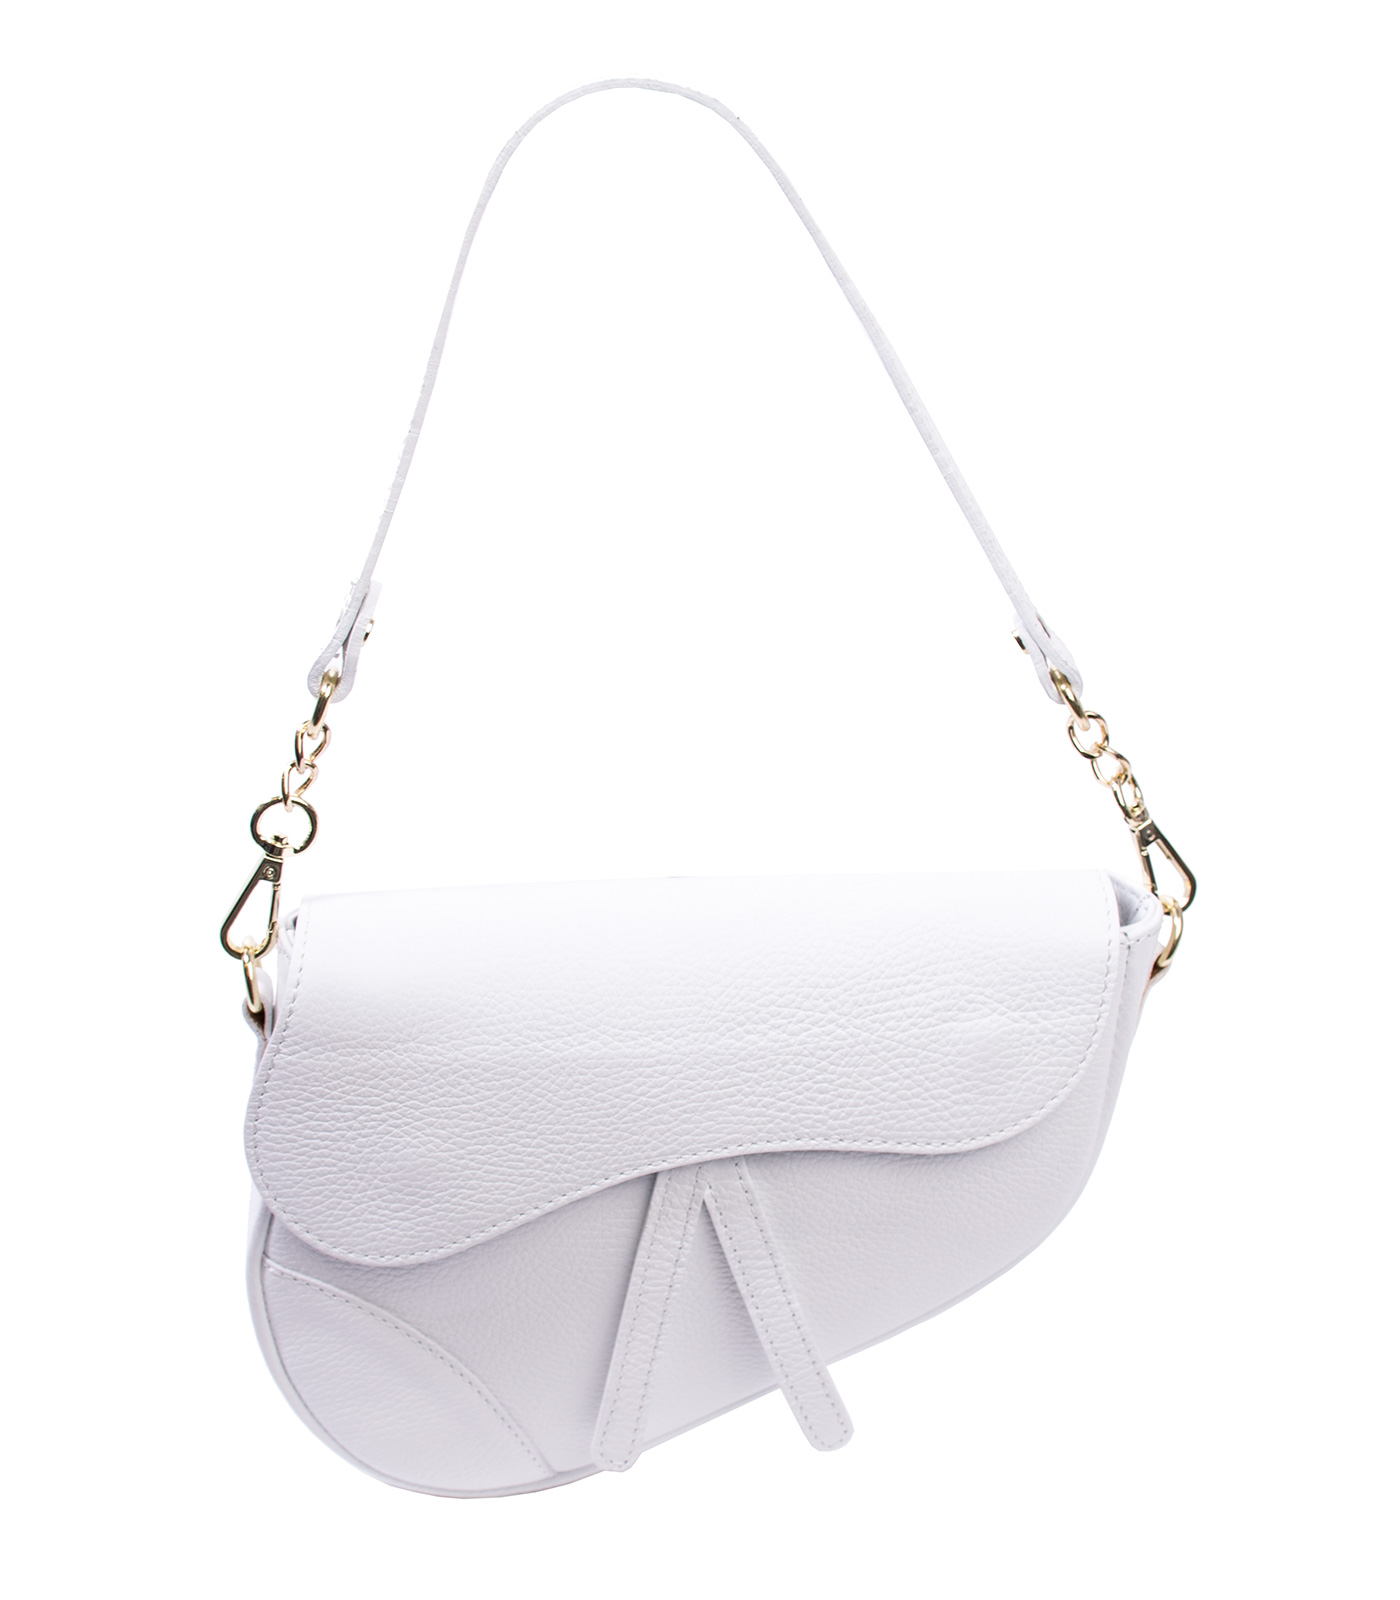 Bags and More Linda Fehér Női Bőr Válltáska